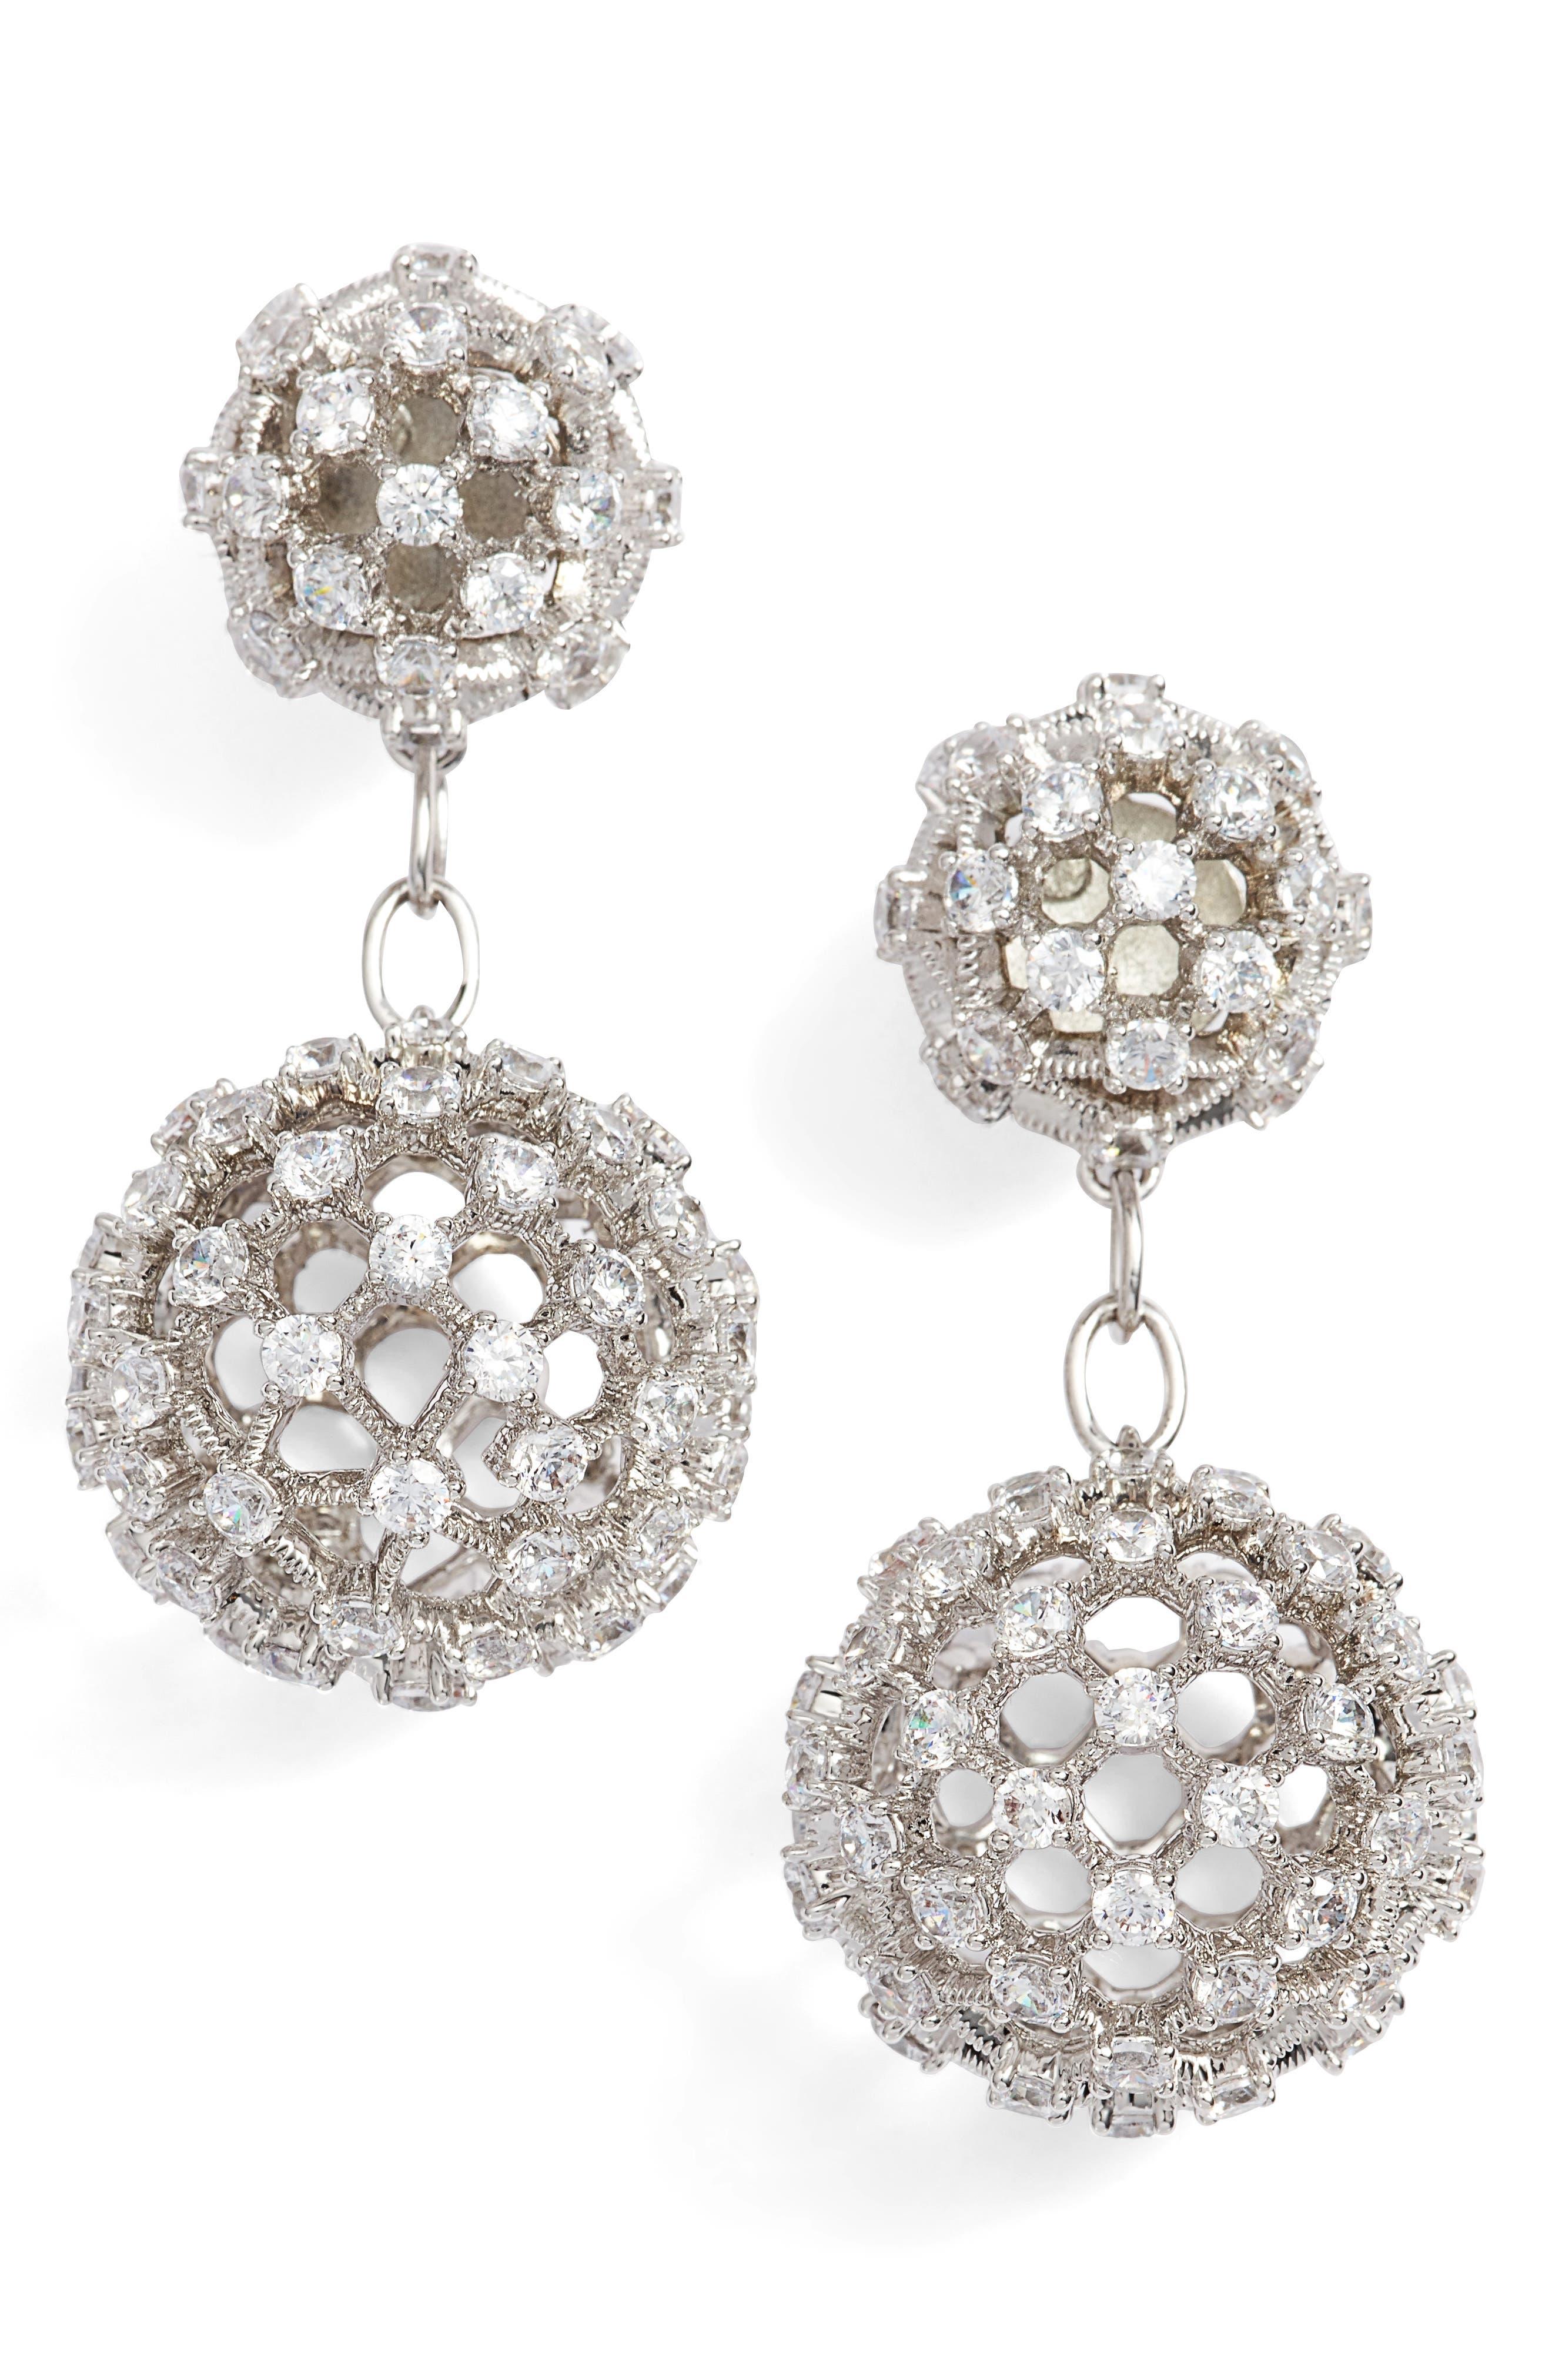 Cubic Zirconia Double Drop Earrings,                             Main thumbnail 1, color,                             040